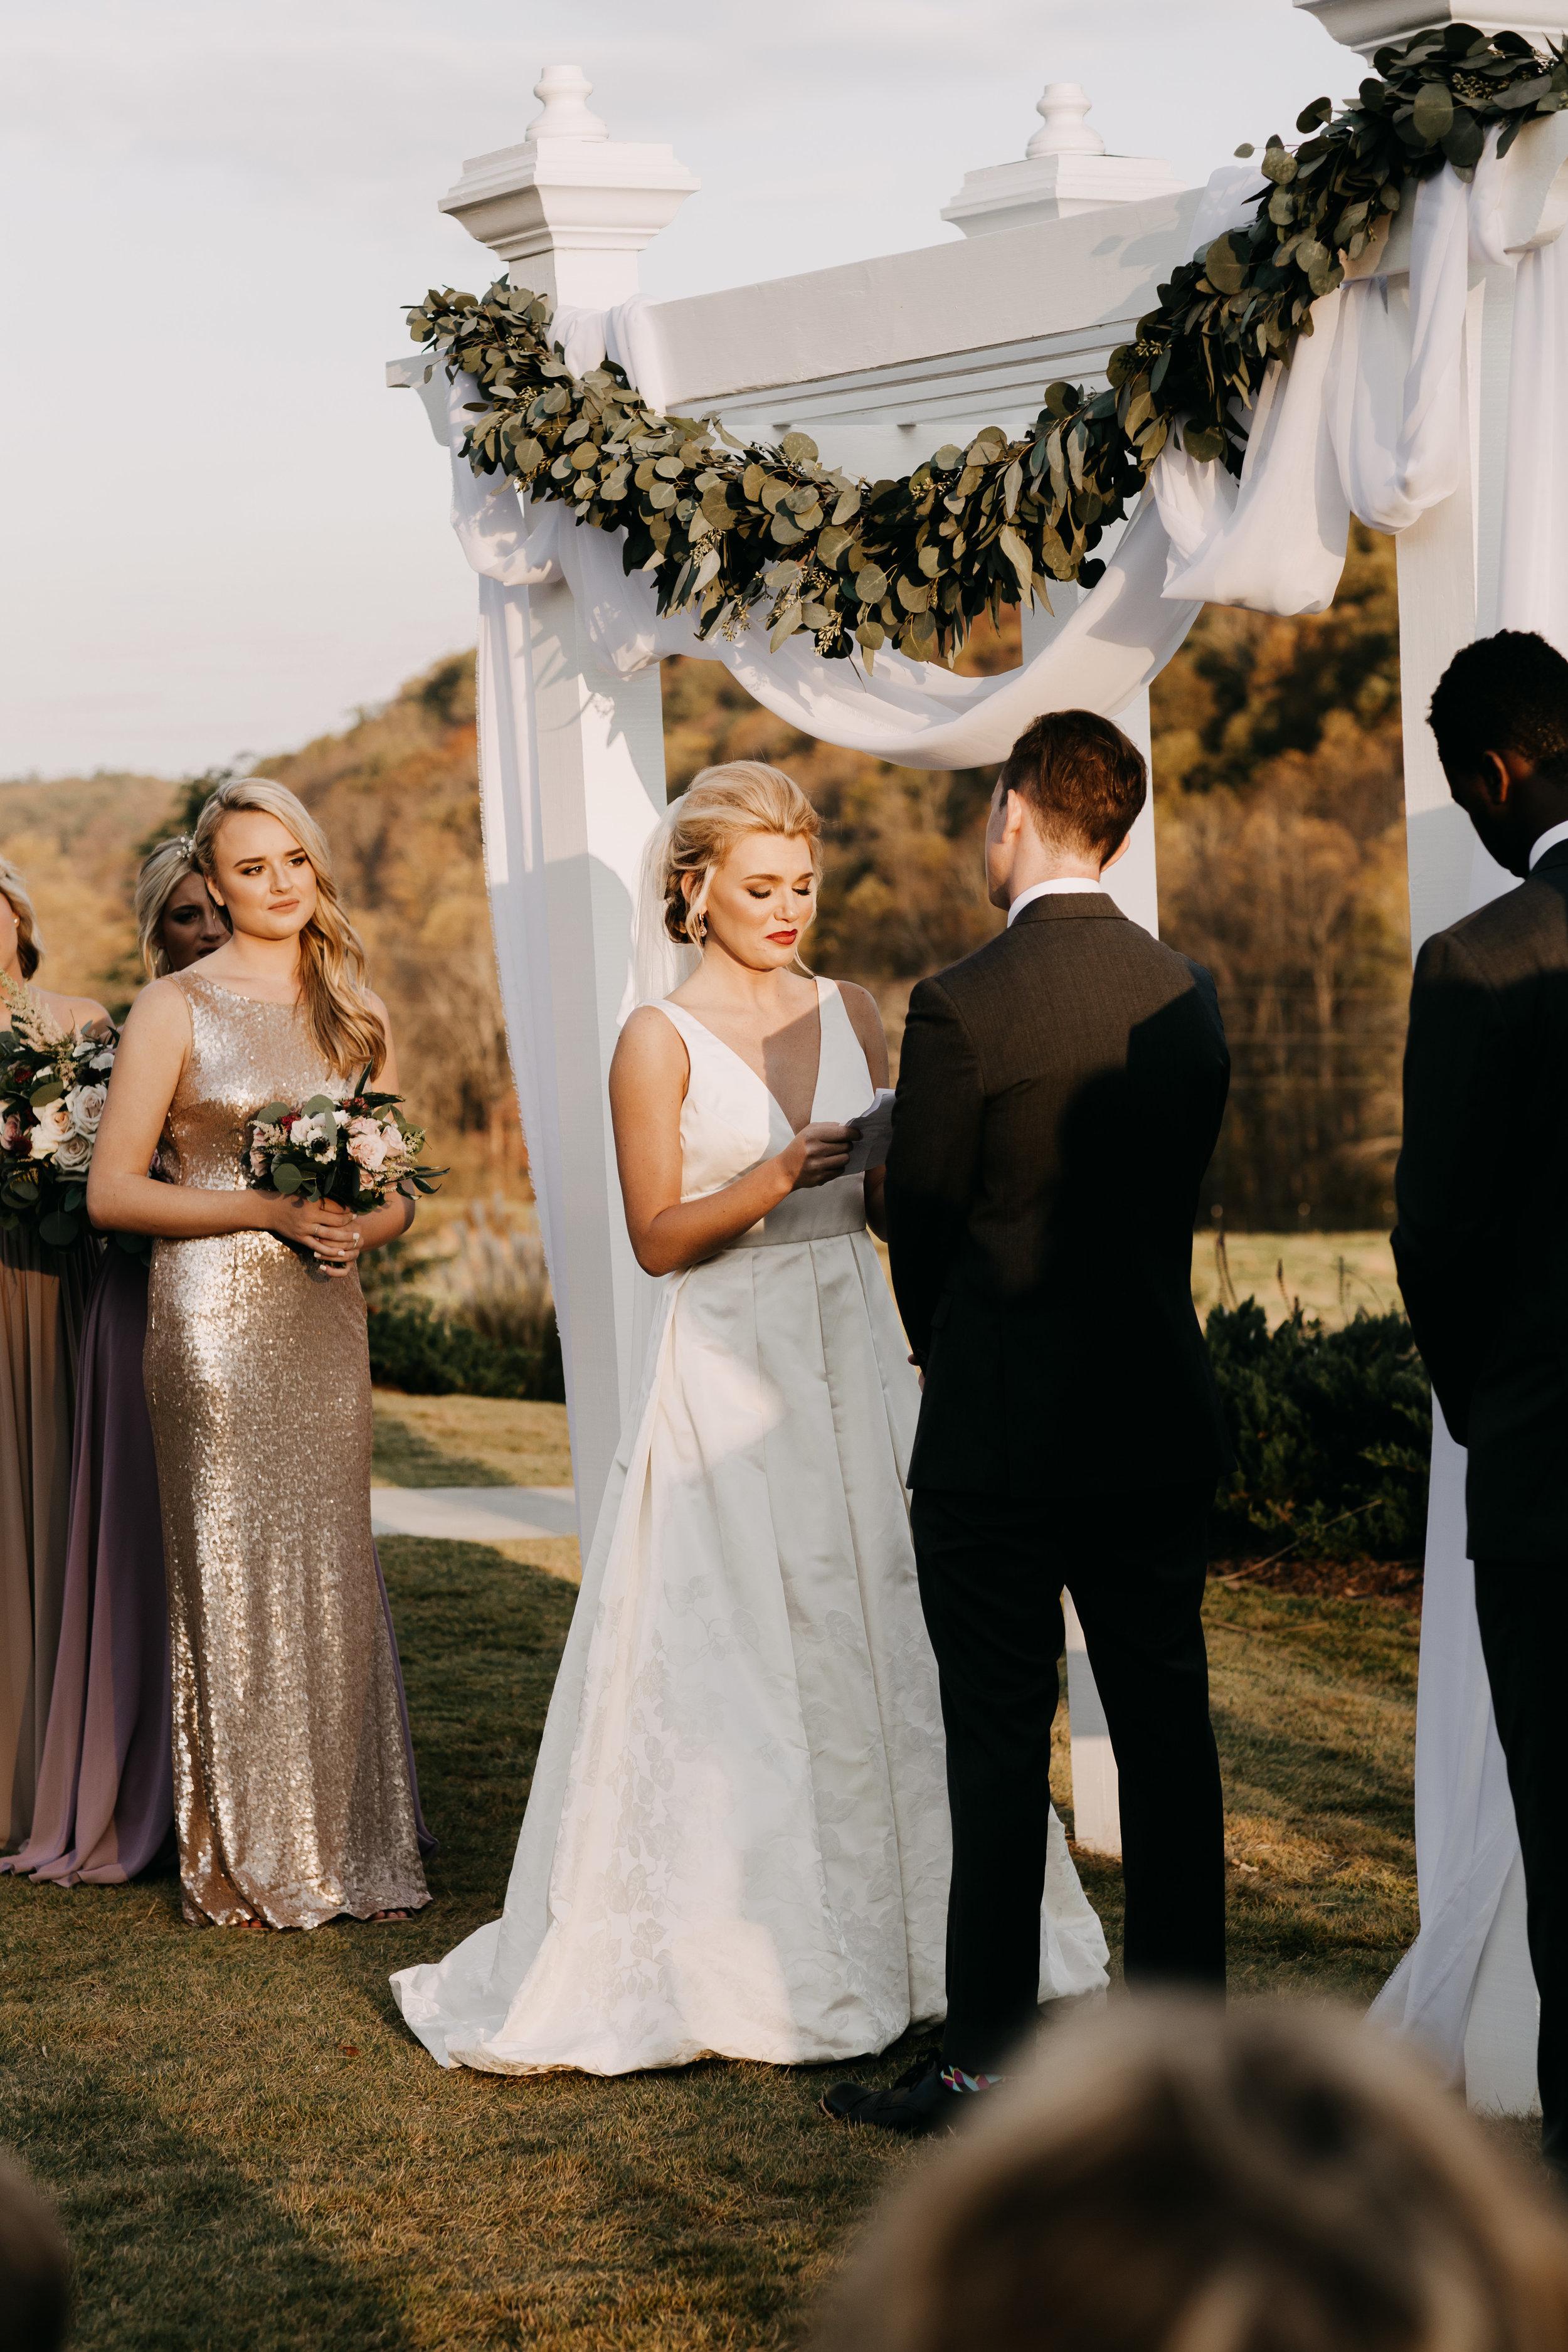 Kaylyn & Ryan Final Wedding Photos360.jpg